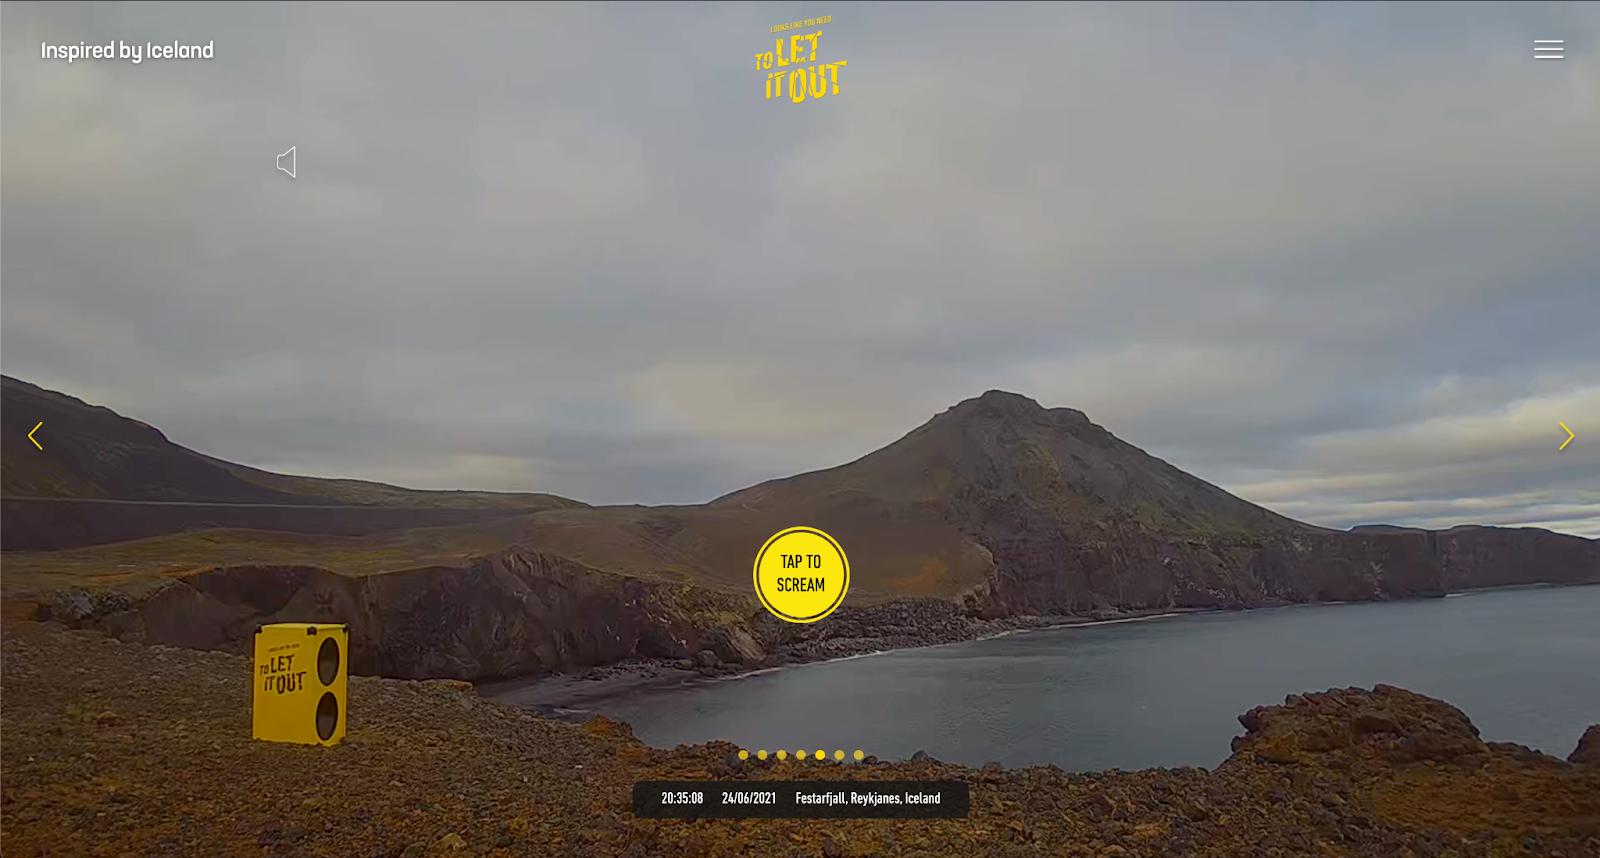 Looks Like You Need Iceland homepage